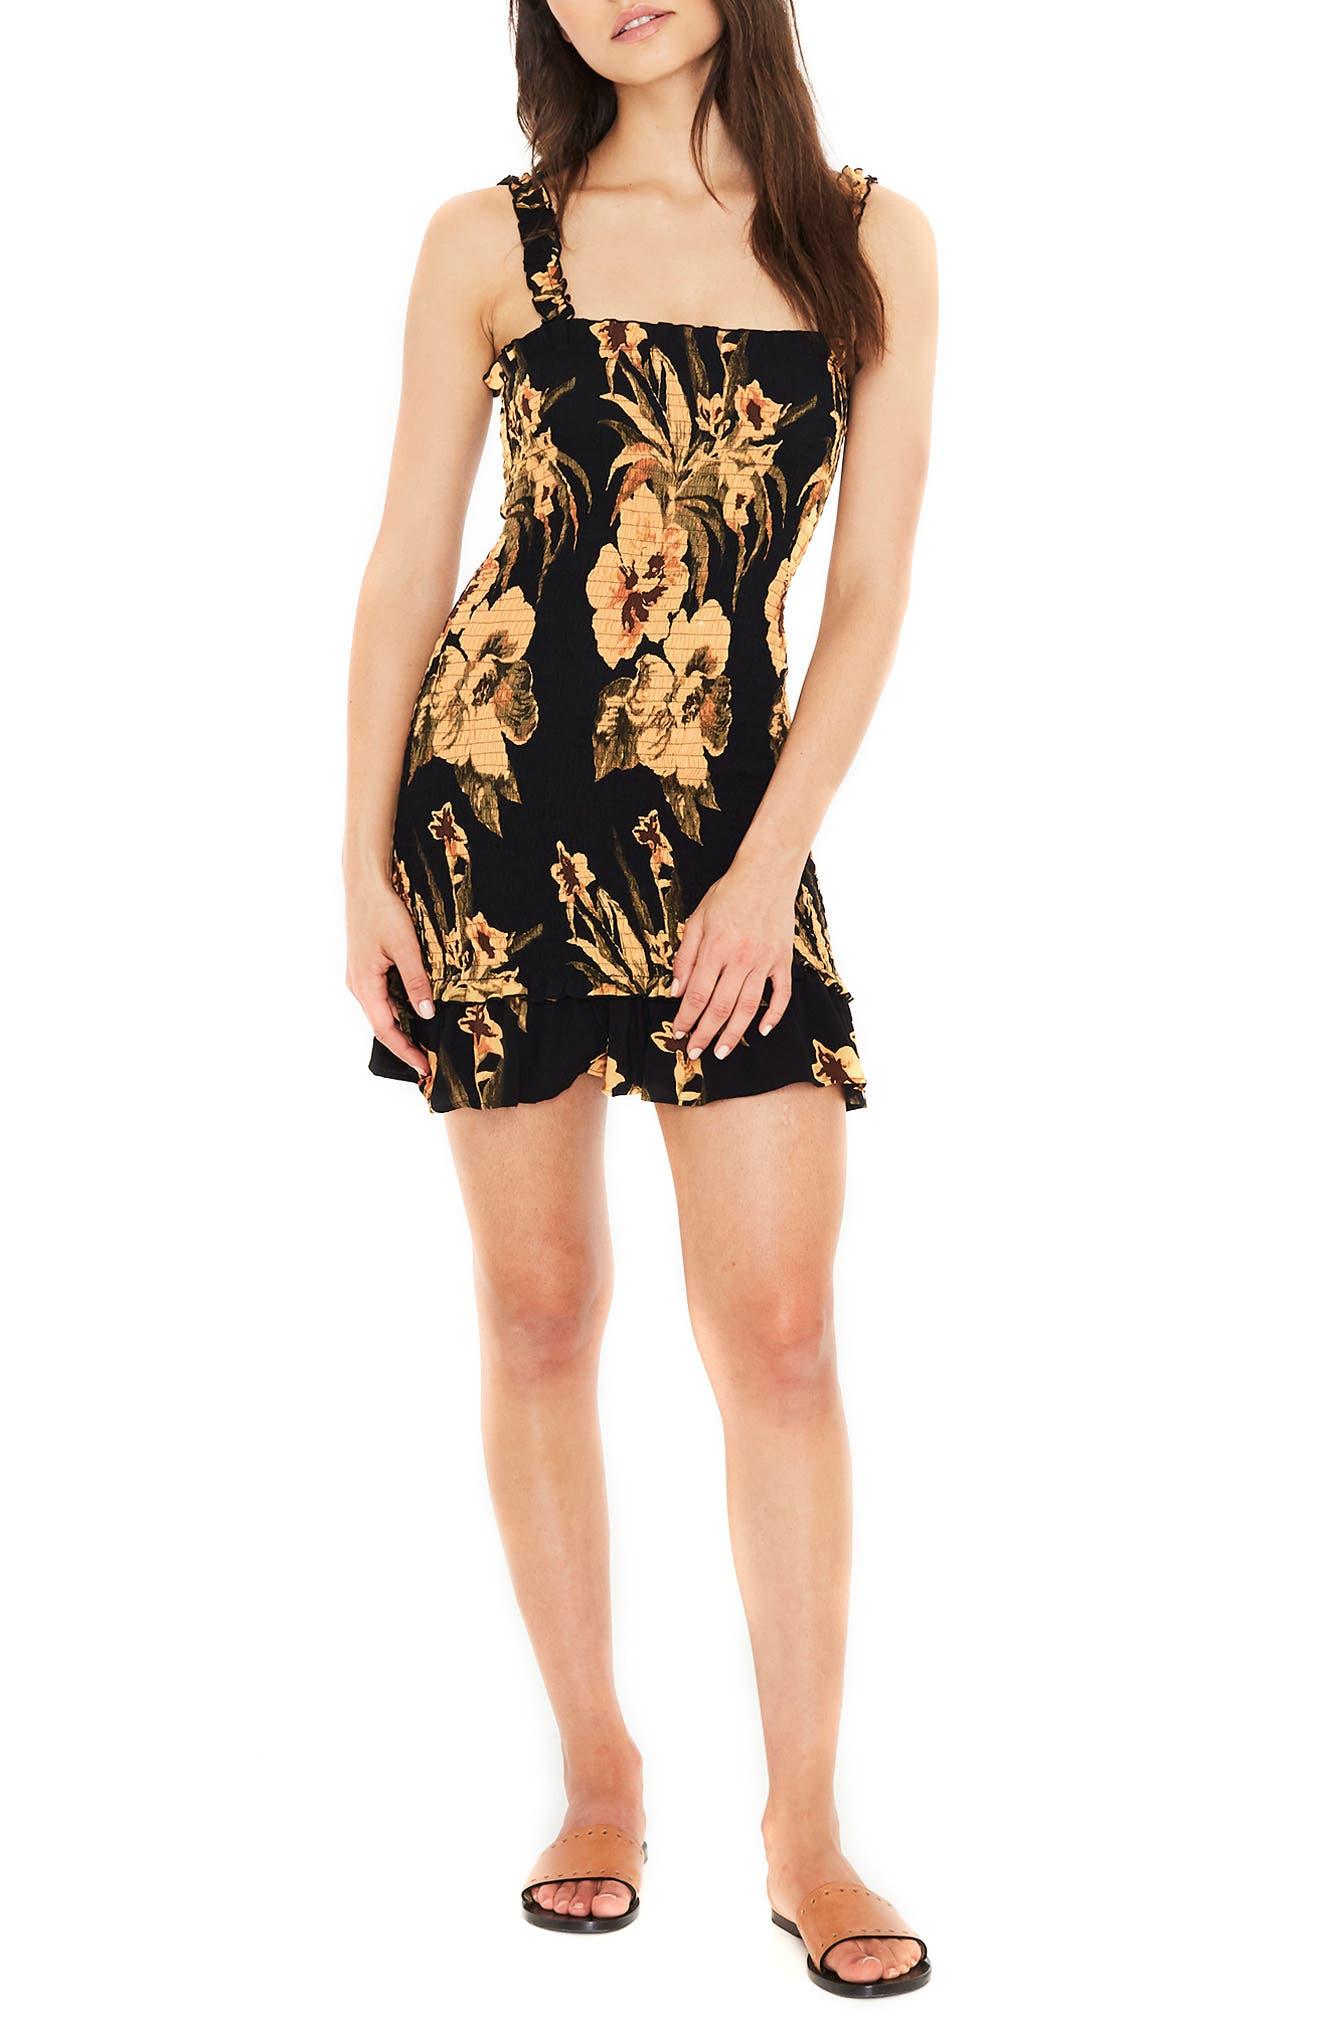 Del Mar Smocked Dress,                         Main,                         color, CARIBBEAN PRINT